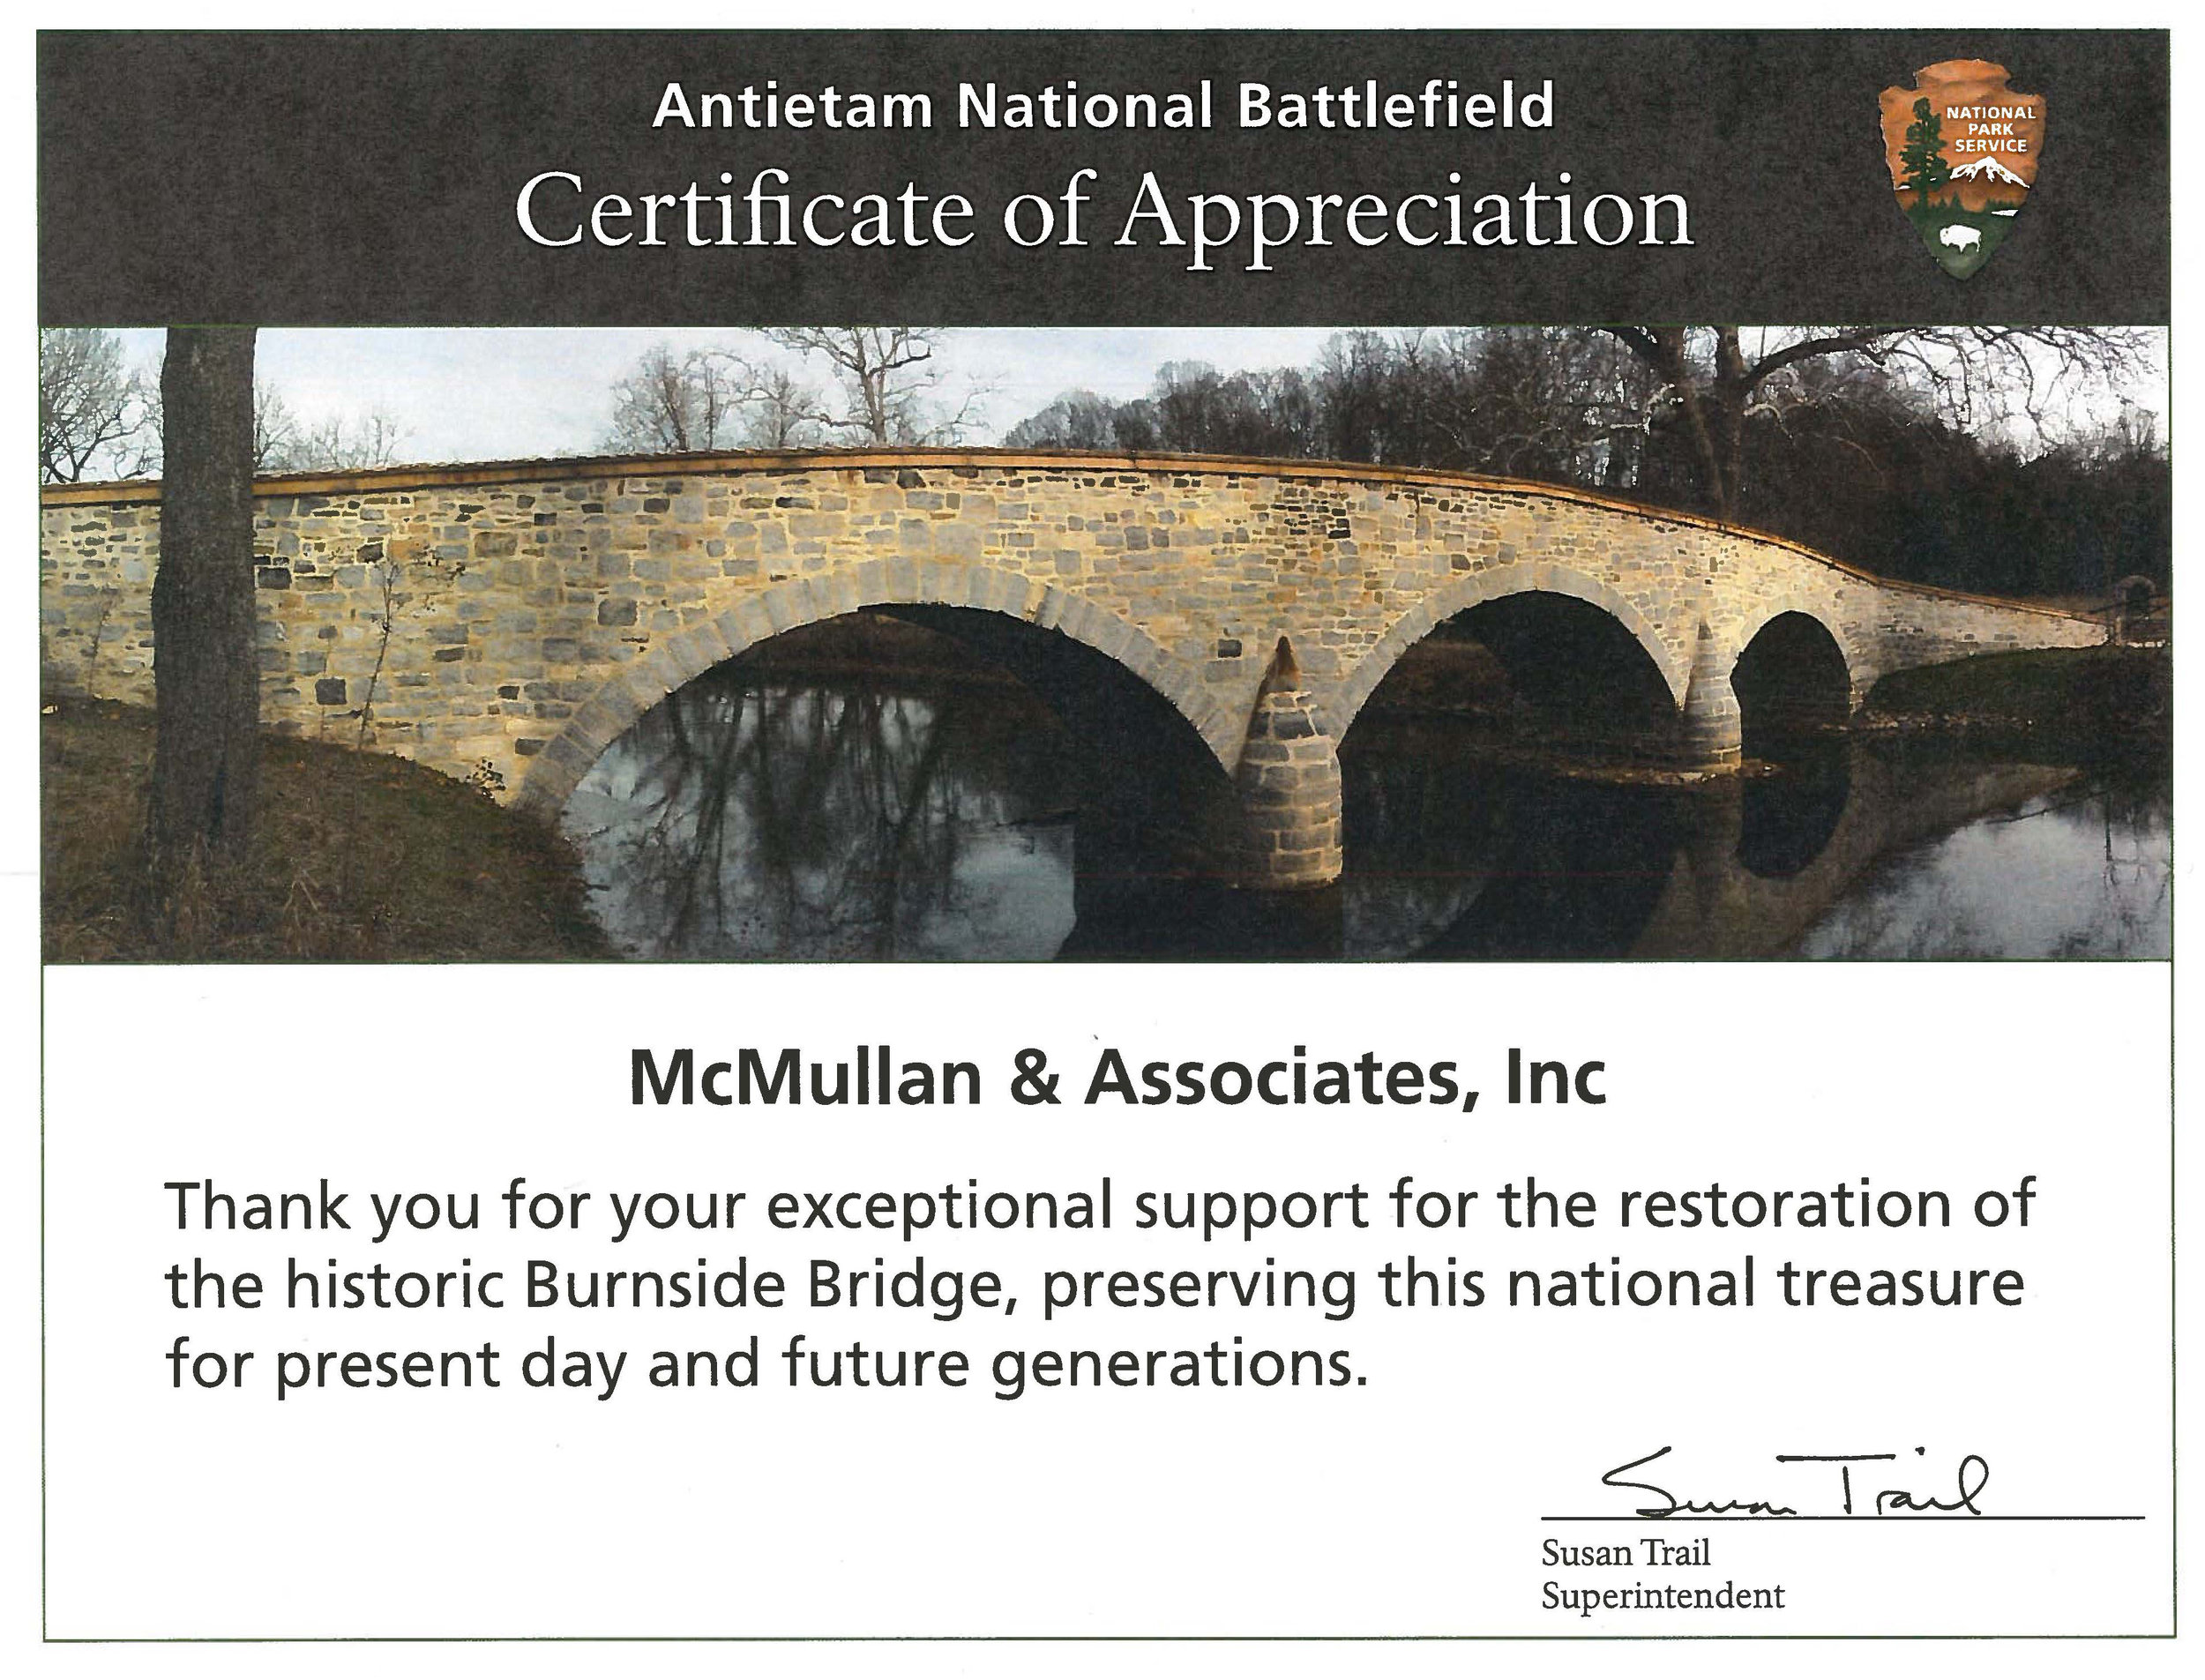 Burnside Bridge_CertificateofAppreciation.jpg